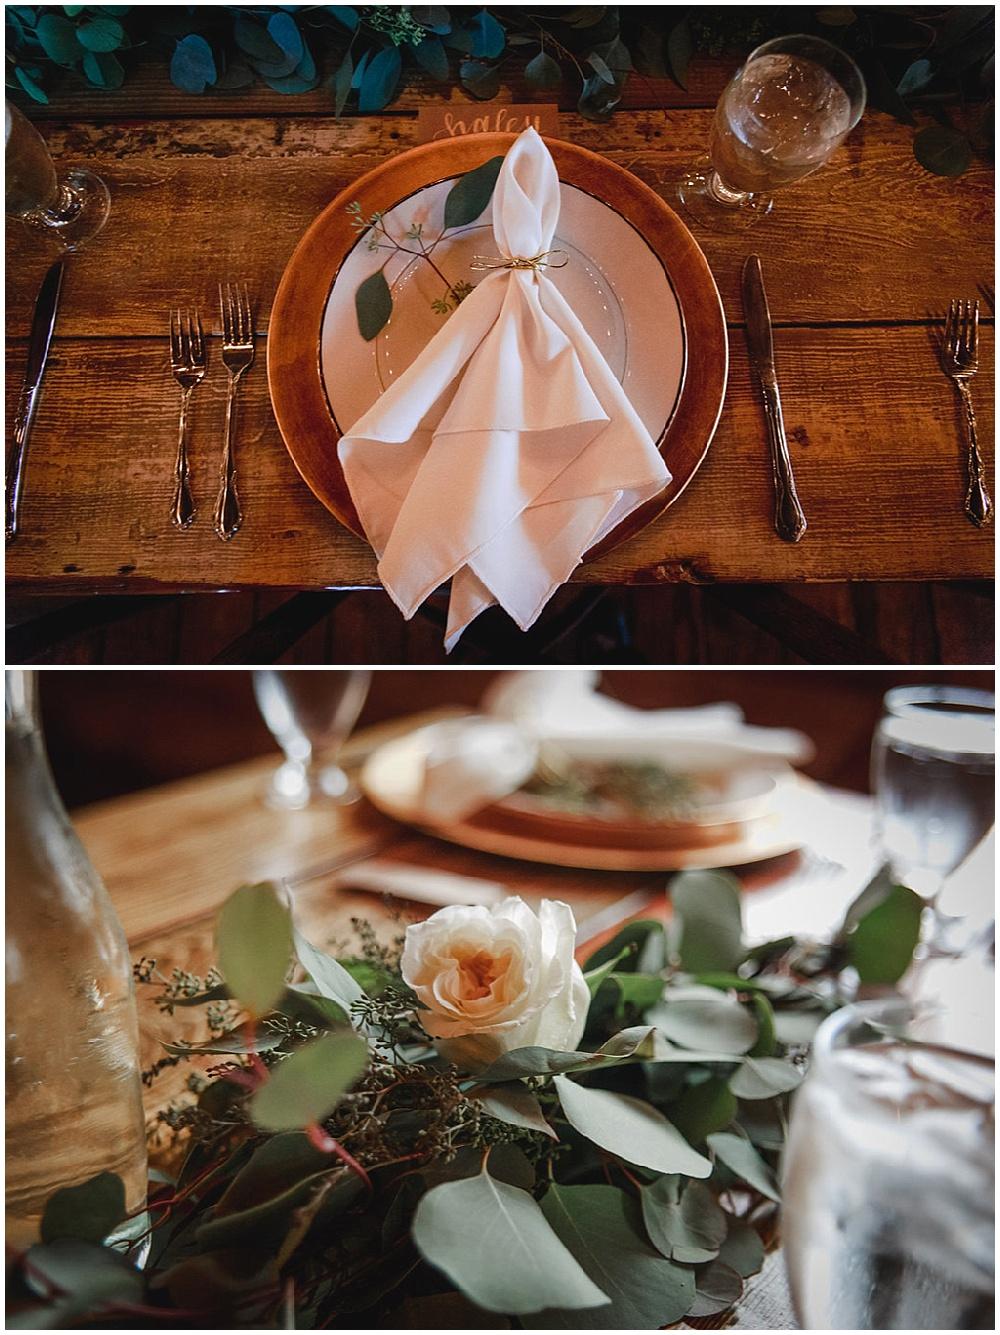 blush table decor with greenery sprigs   Chicago urban rustic wedding  Sandra Armenteros Photography   Jessica Dum Wedding Coordination